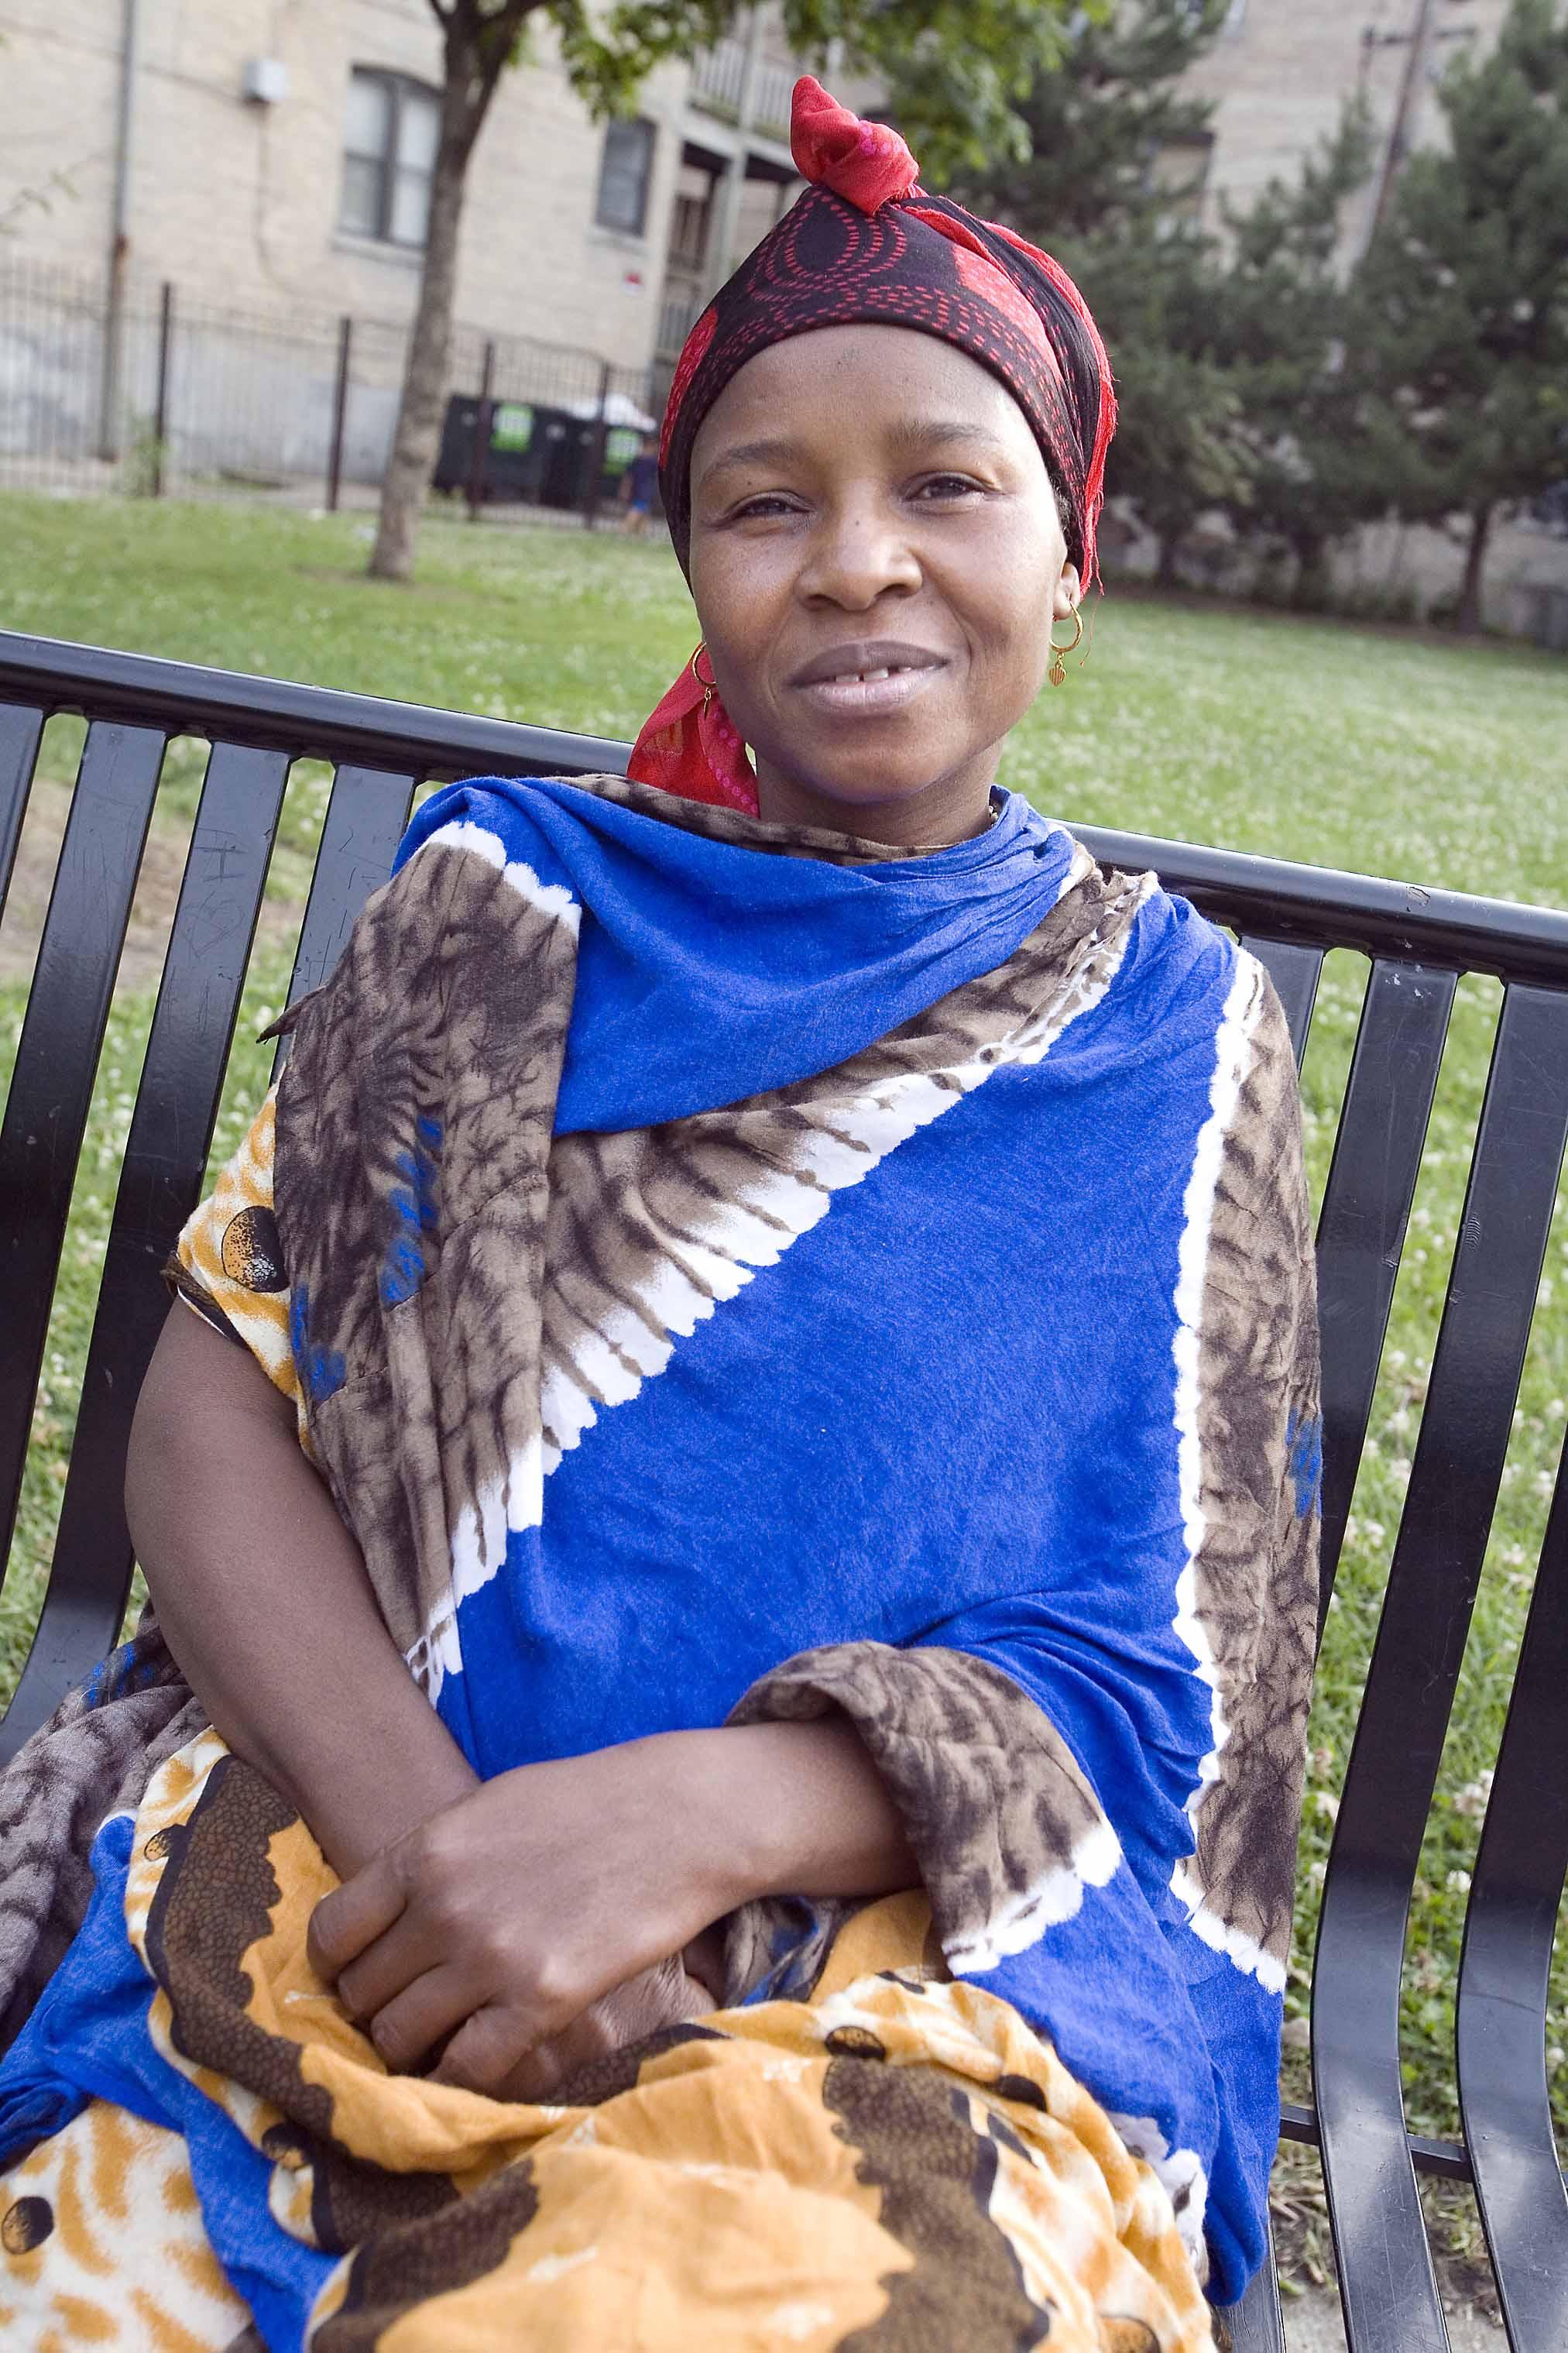 Fatima Mohammed, a native Somalia, enjoys a summer day in Ronan Park, 3000 W. Argyle, in the Albany Park neighborhood.